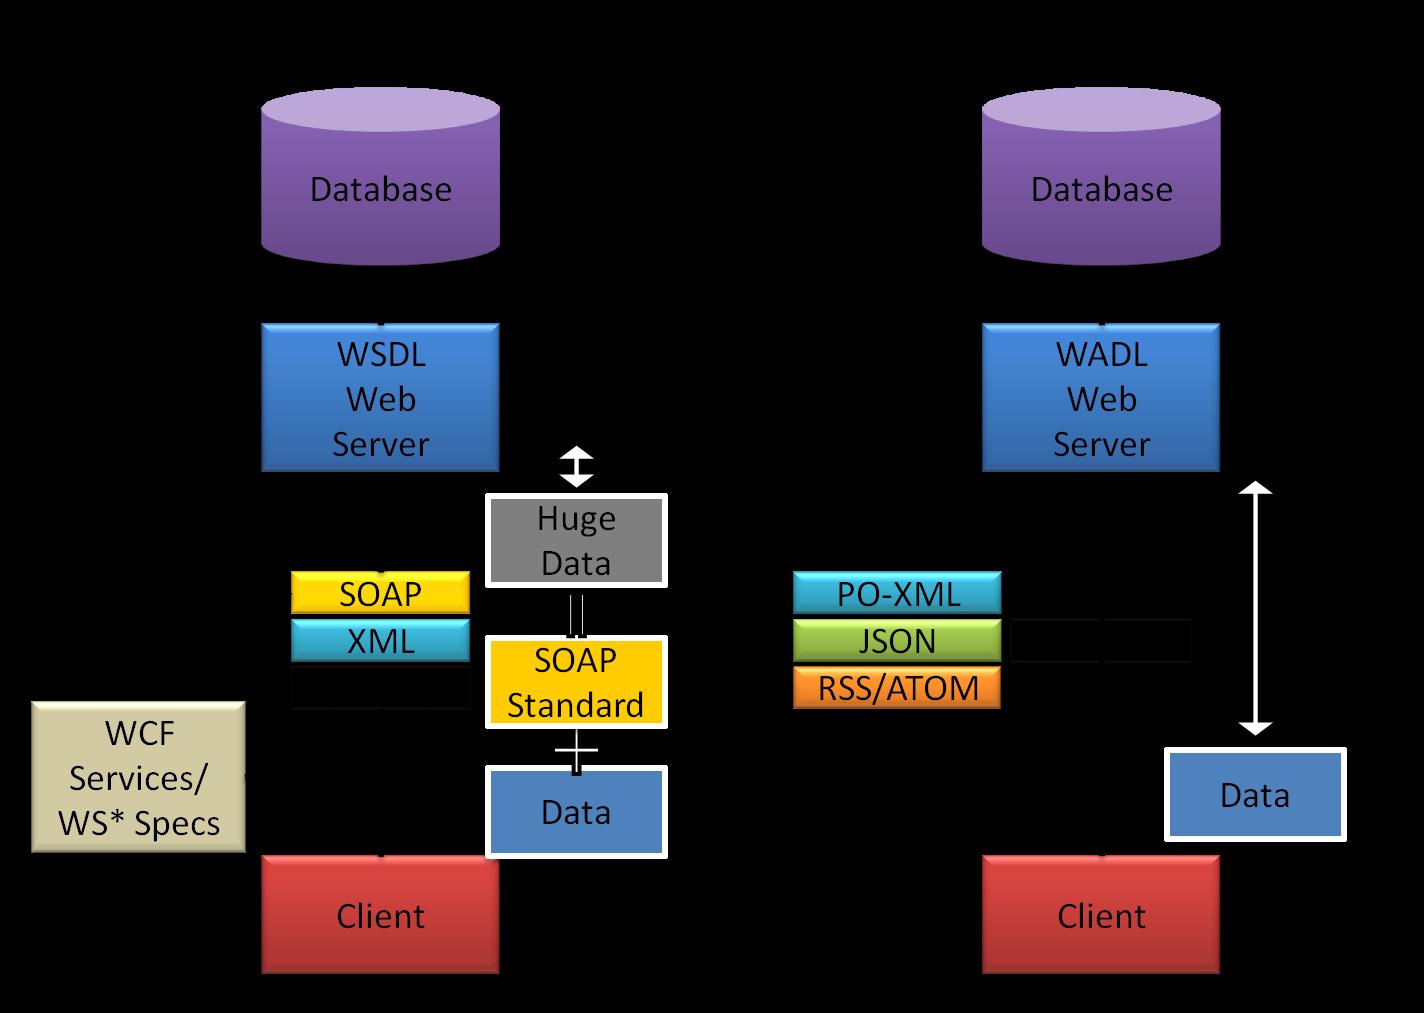 LiuLyndon Look For: [MVC] REST API vs SOAP Web Services